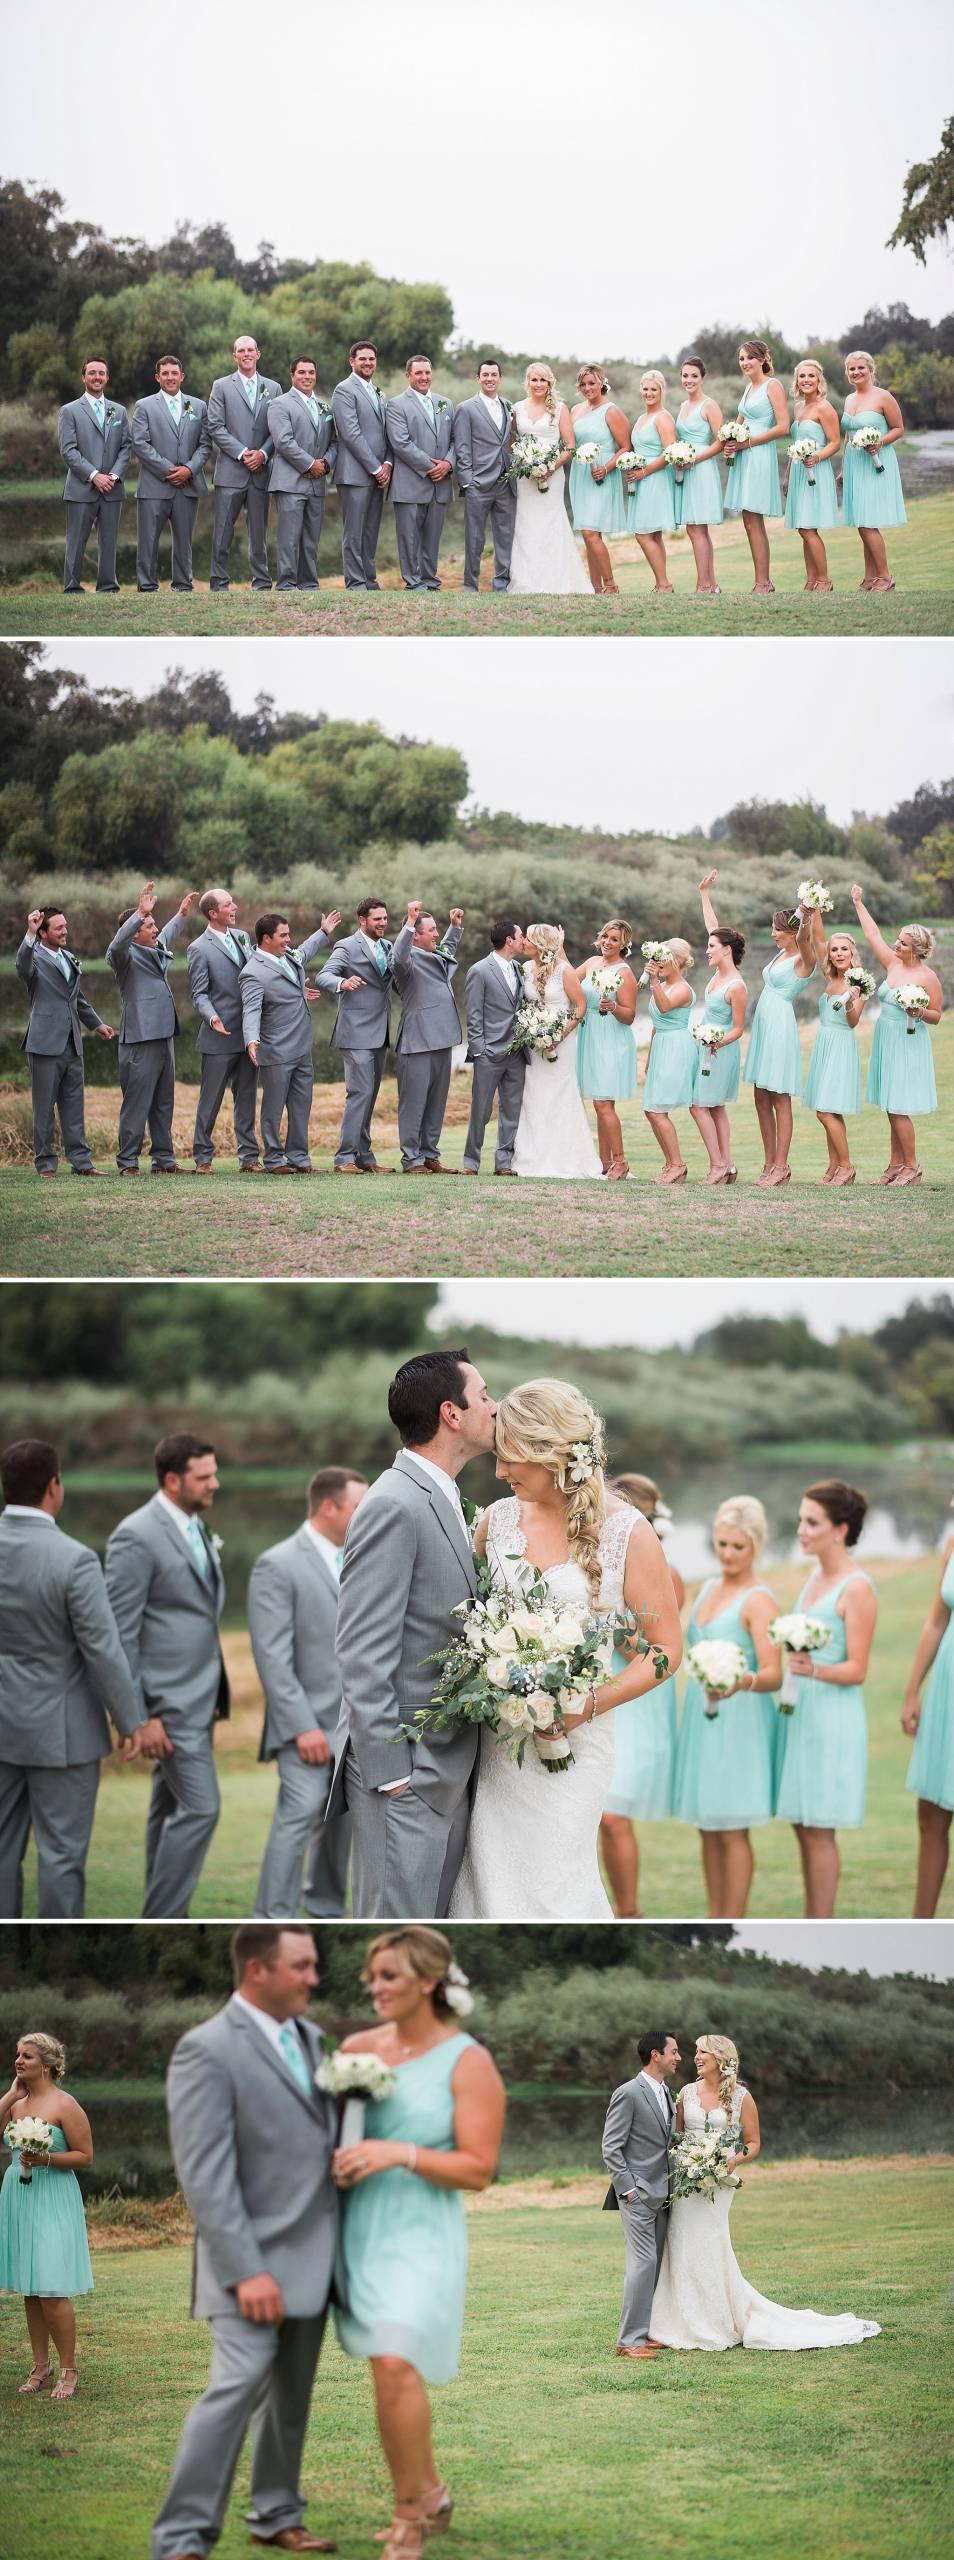 Erin + Marcel Third Element Photography & Cinema Fresno County Estate Wedding Hybrid Film Wedding Photographer_0025